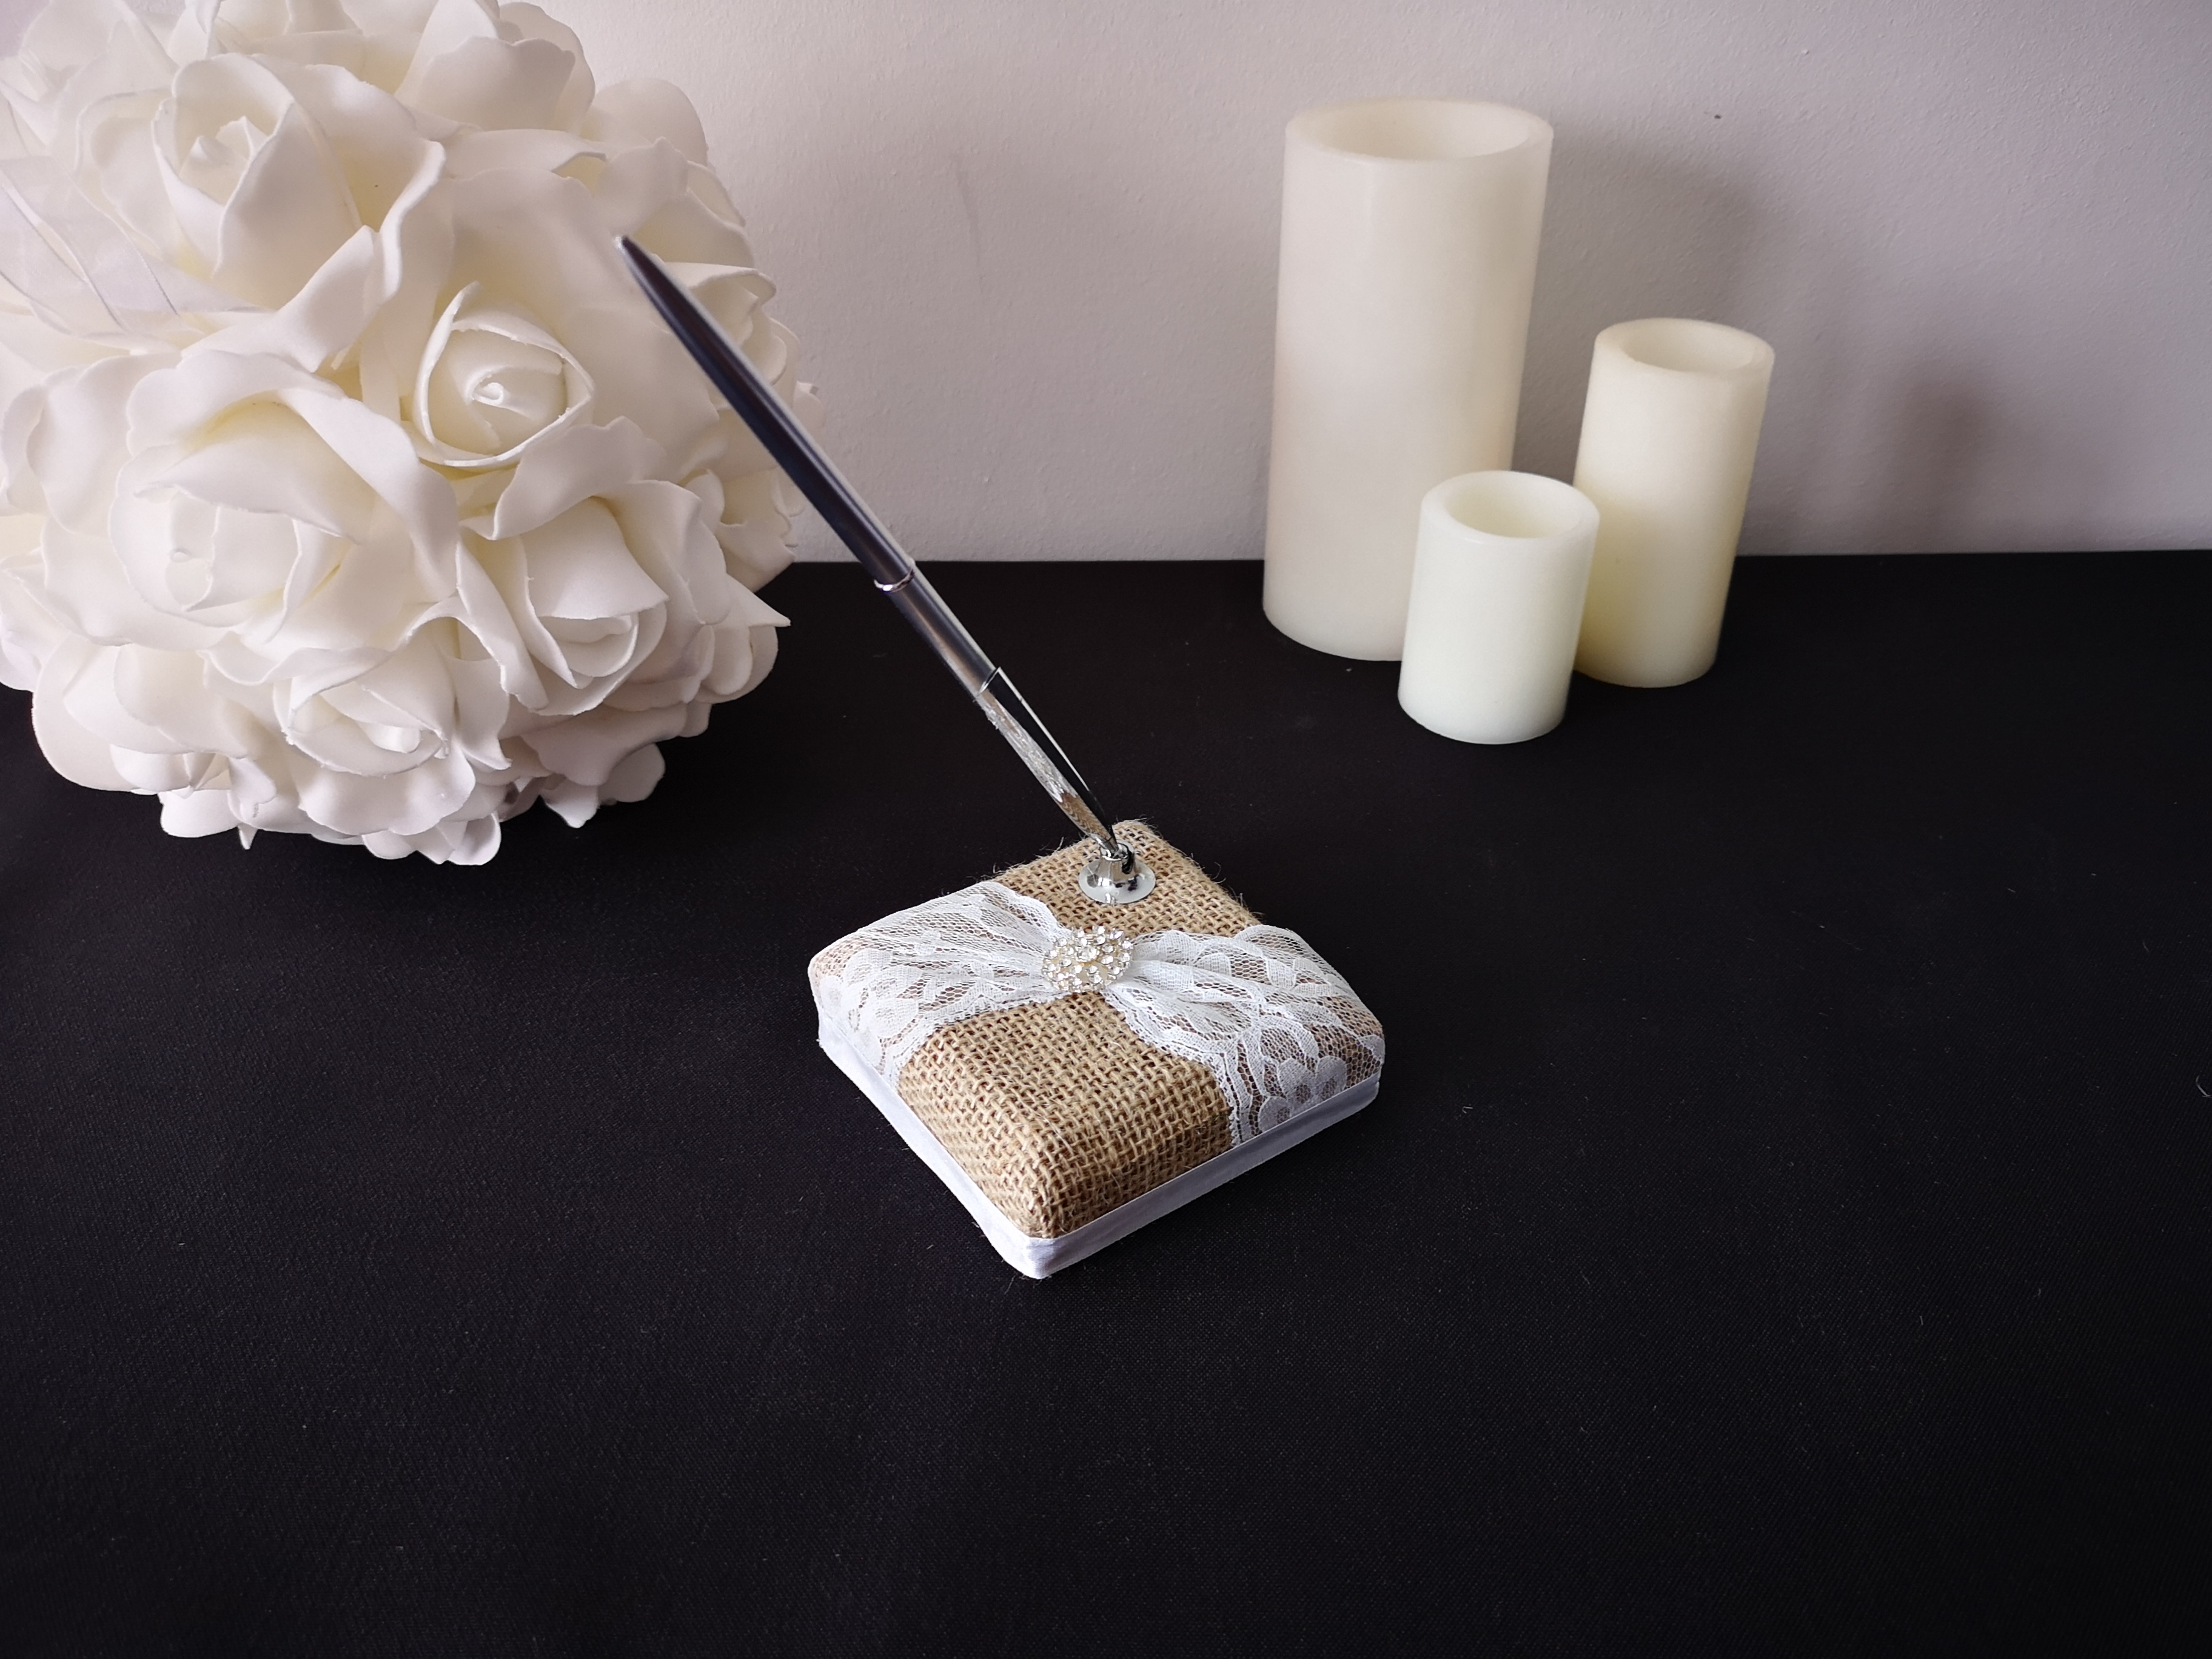 Burlap and Lace Wedding Pen Burlap-and-Lace-Wedding-Pen